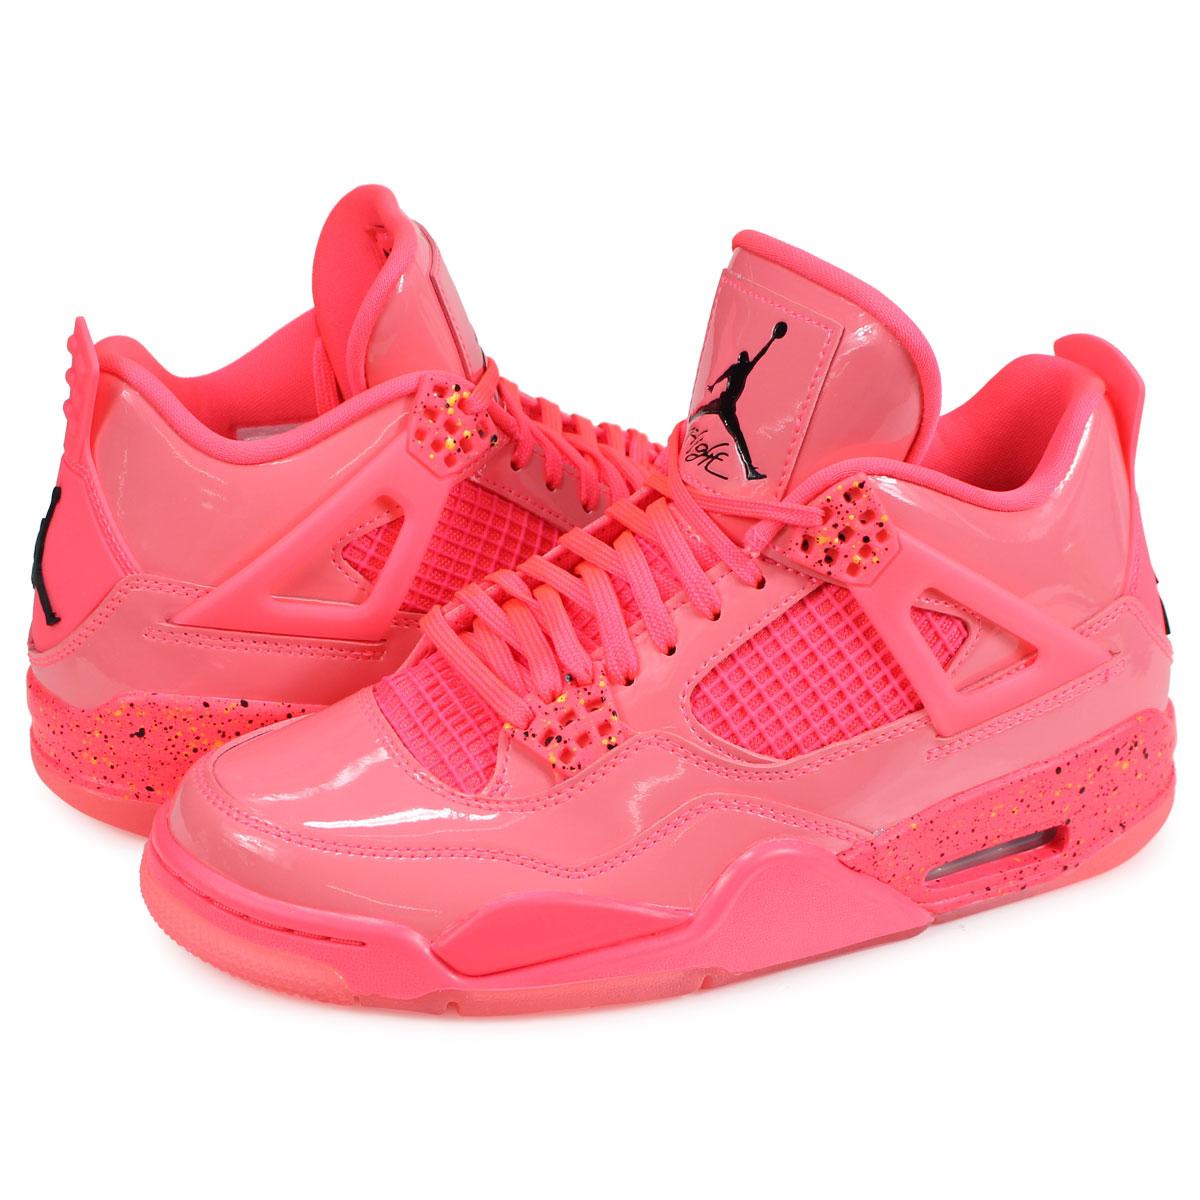 reputable site 23610 f2806 Nike NIKE Air Jordan 4 nostalgic sneakers Lady s men WMNS AIR JORDAN 4 RETRO  NRG pink ...